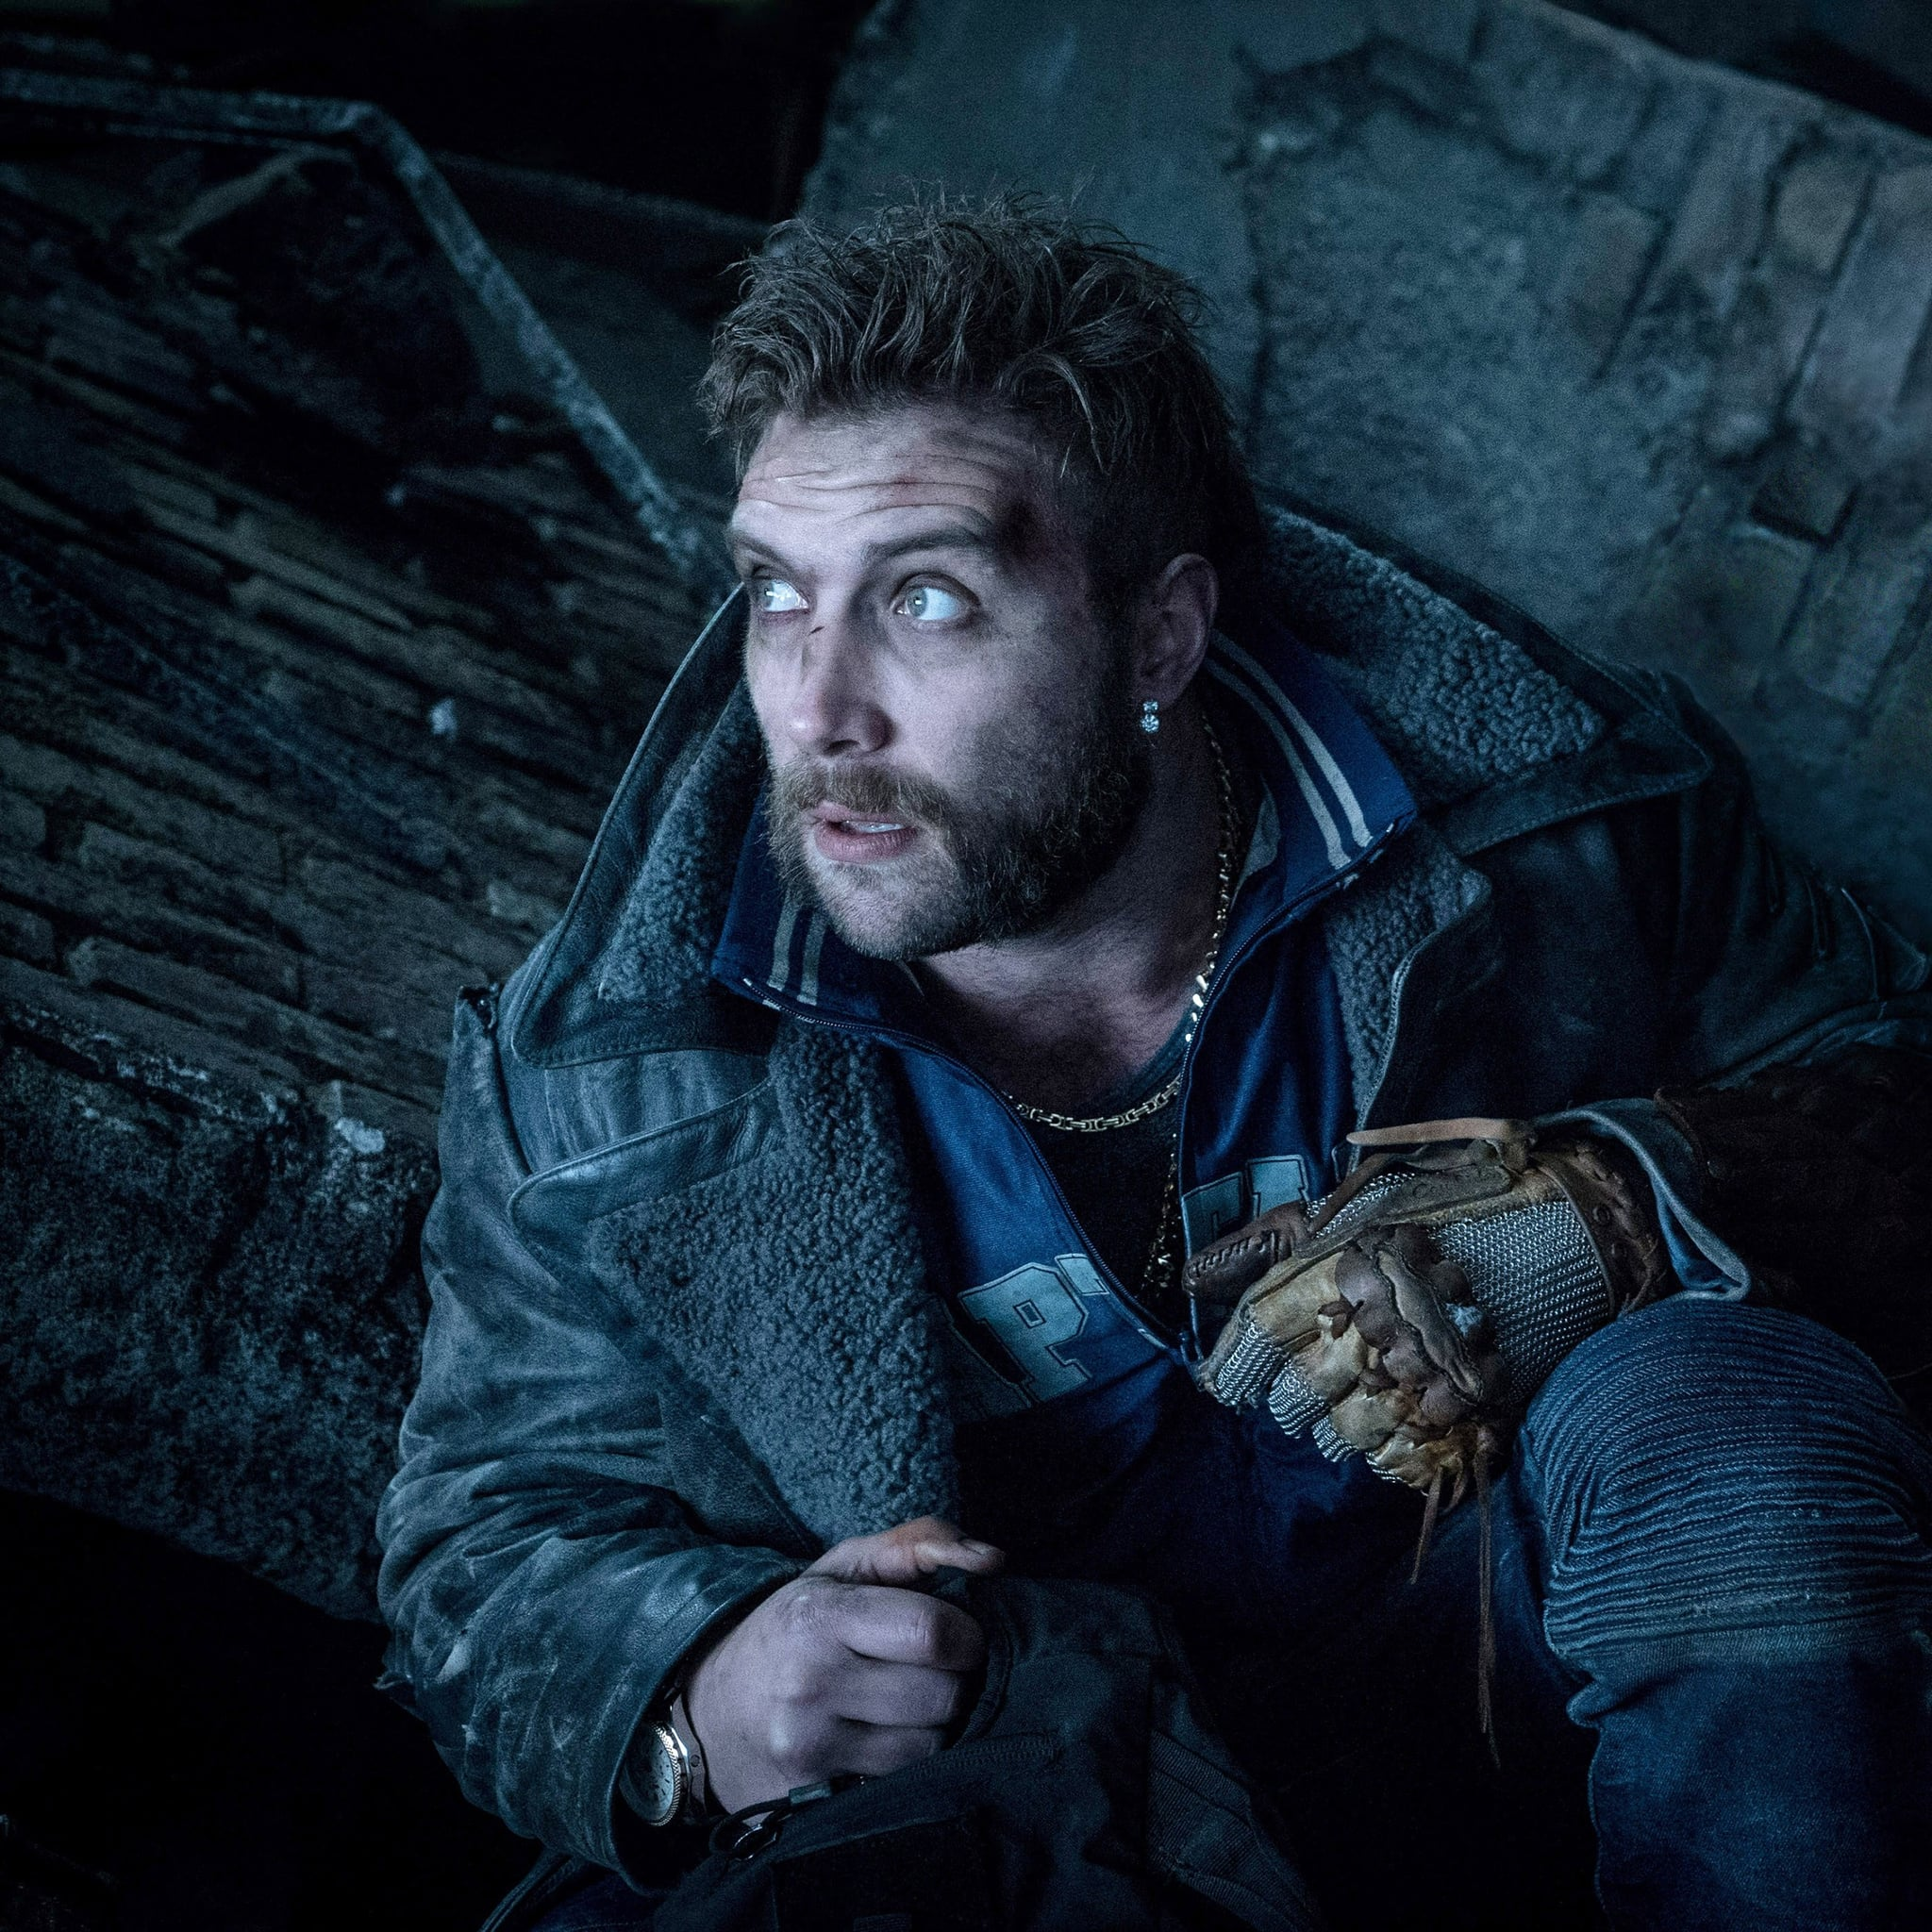 Warner Bros  DC Movie Release Schedule 2019, 2020, and 2021